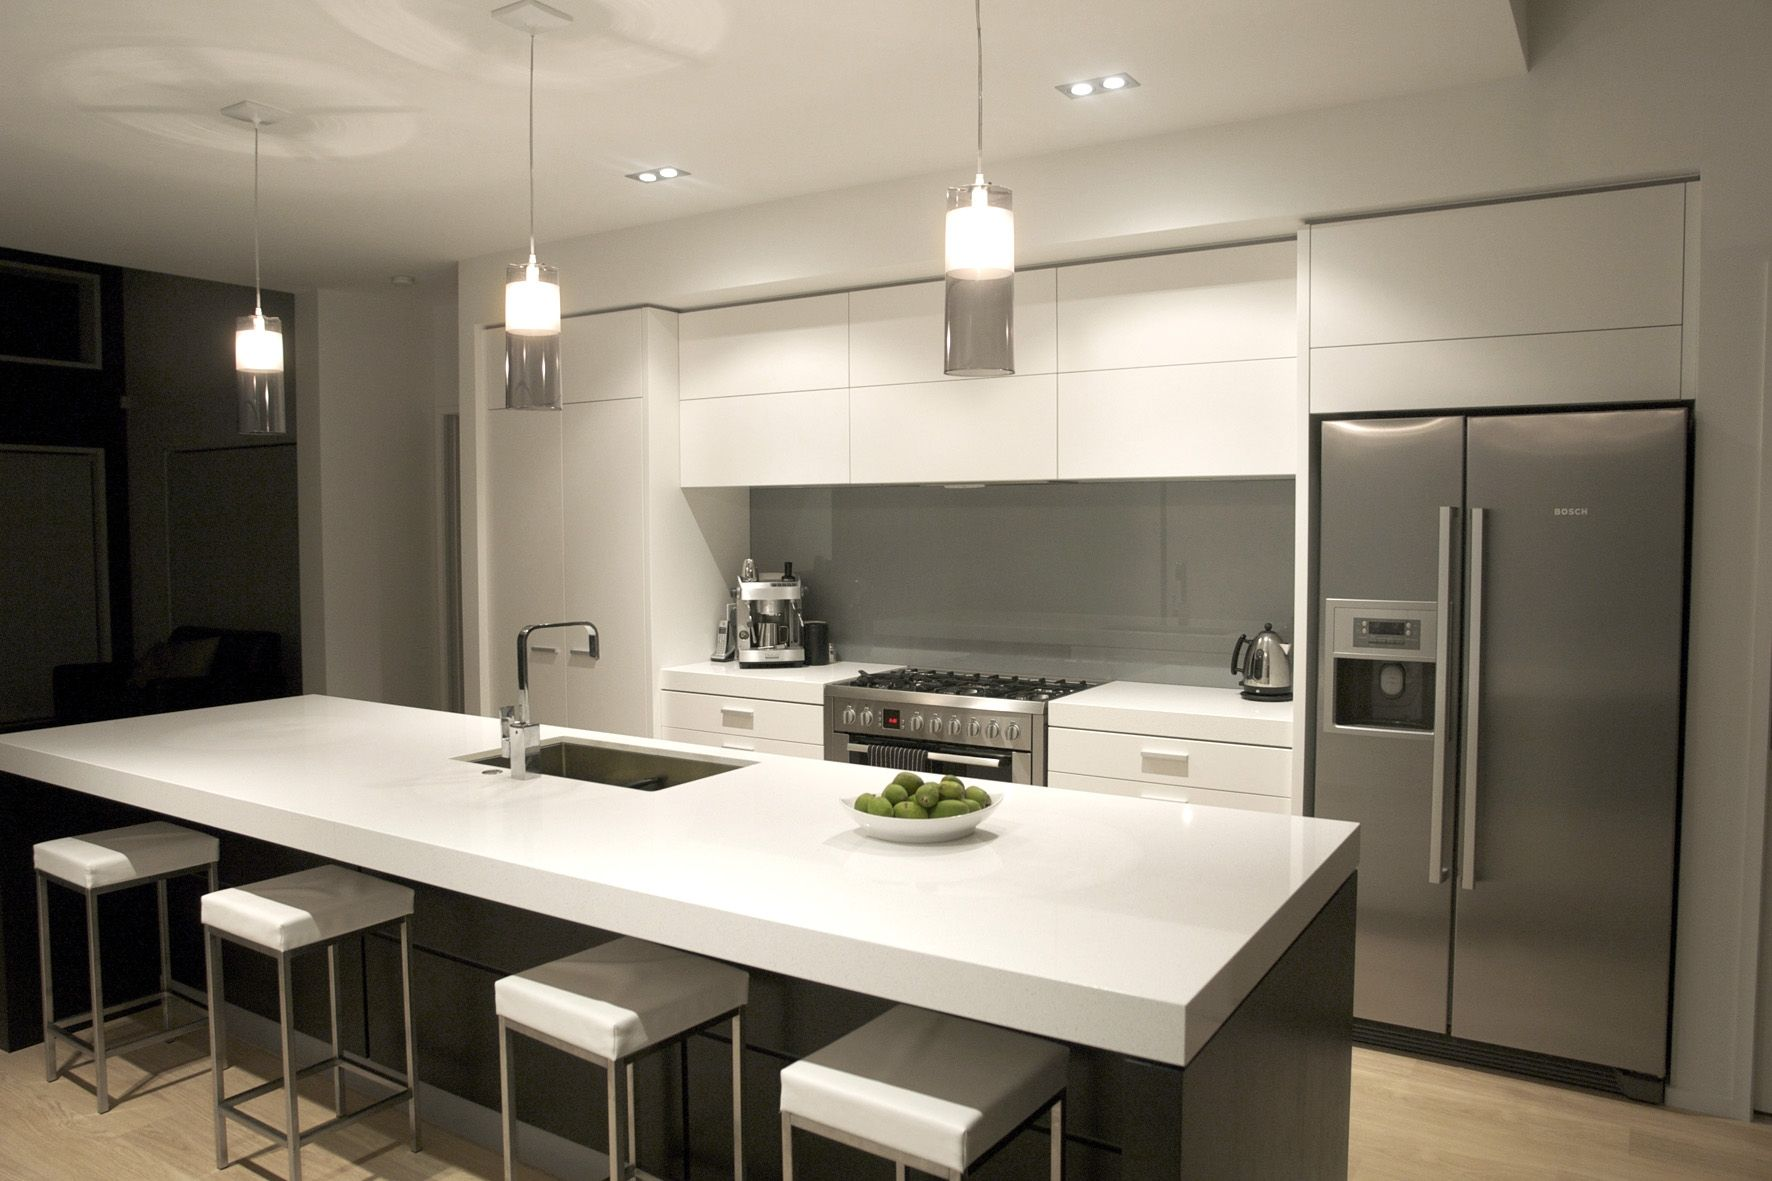 modern kitchen designs nz google search modern kitchen home kitchens modern kitchen design on kitchen ideas modern id=47445